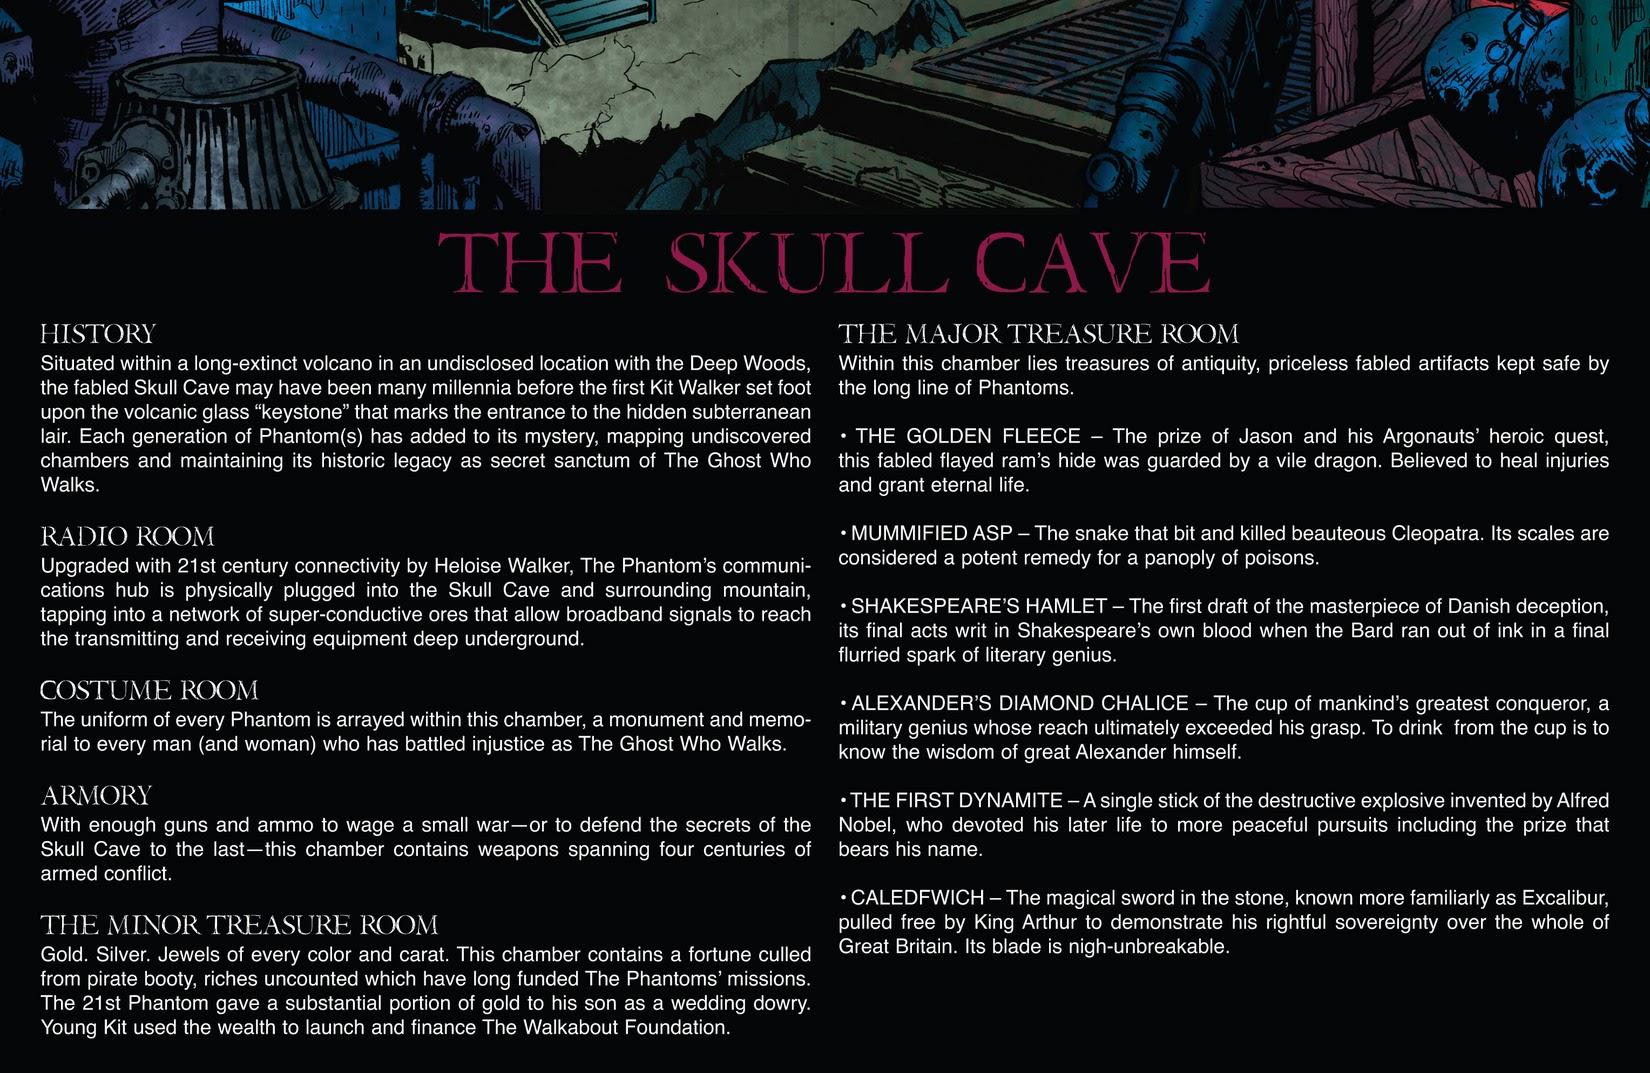 The Last Phantom Annual_1 Page 34